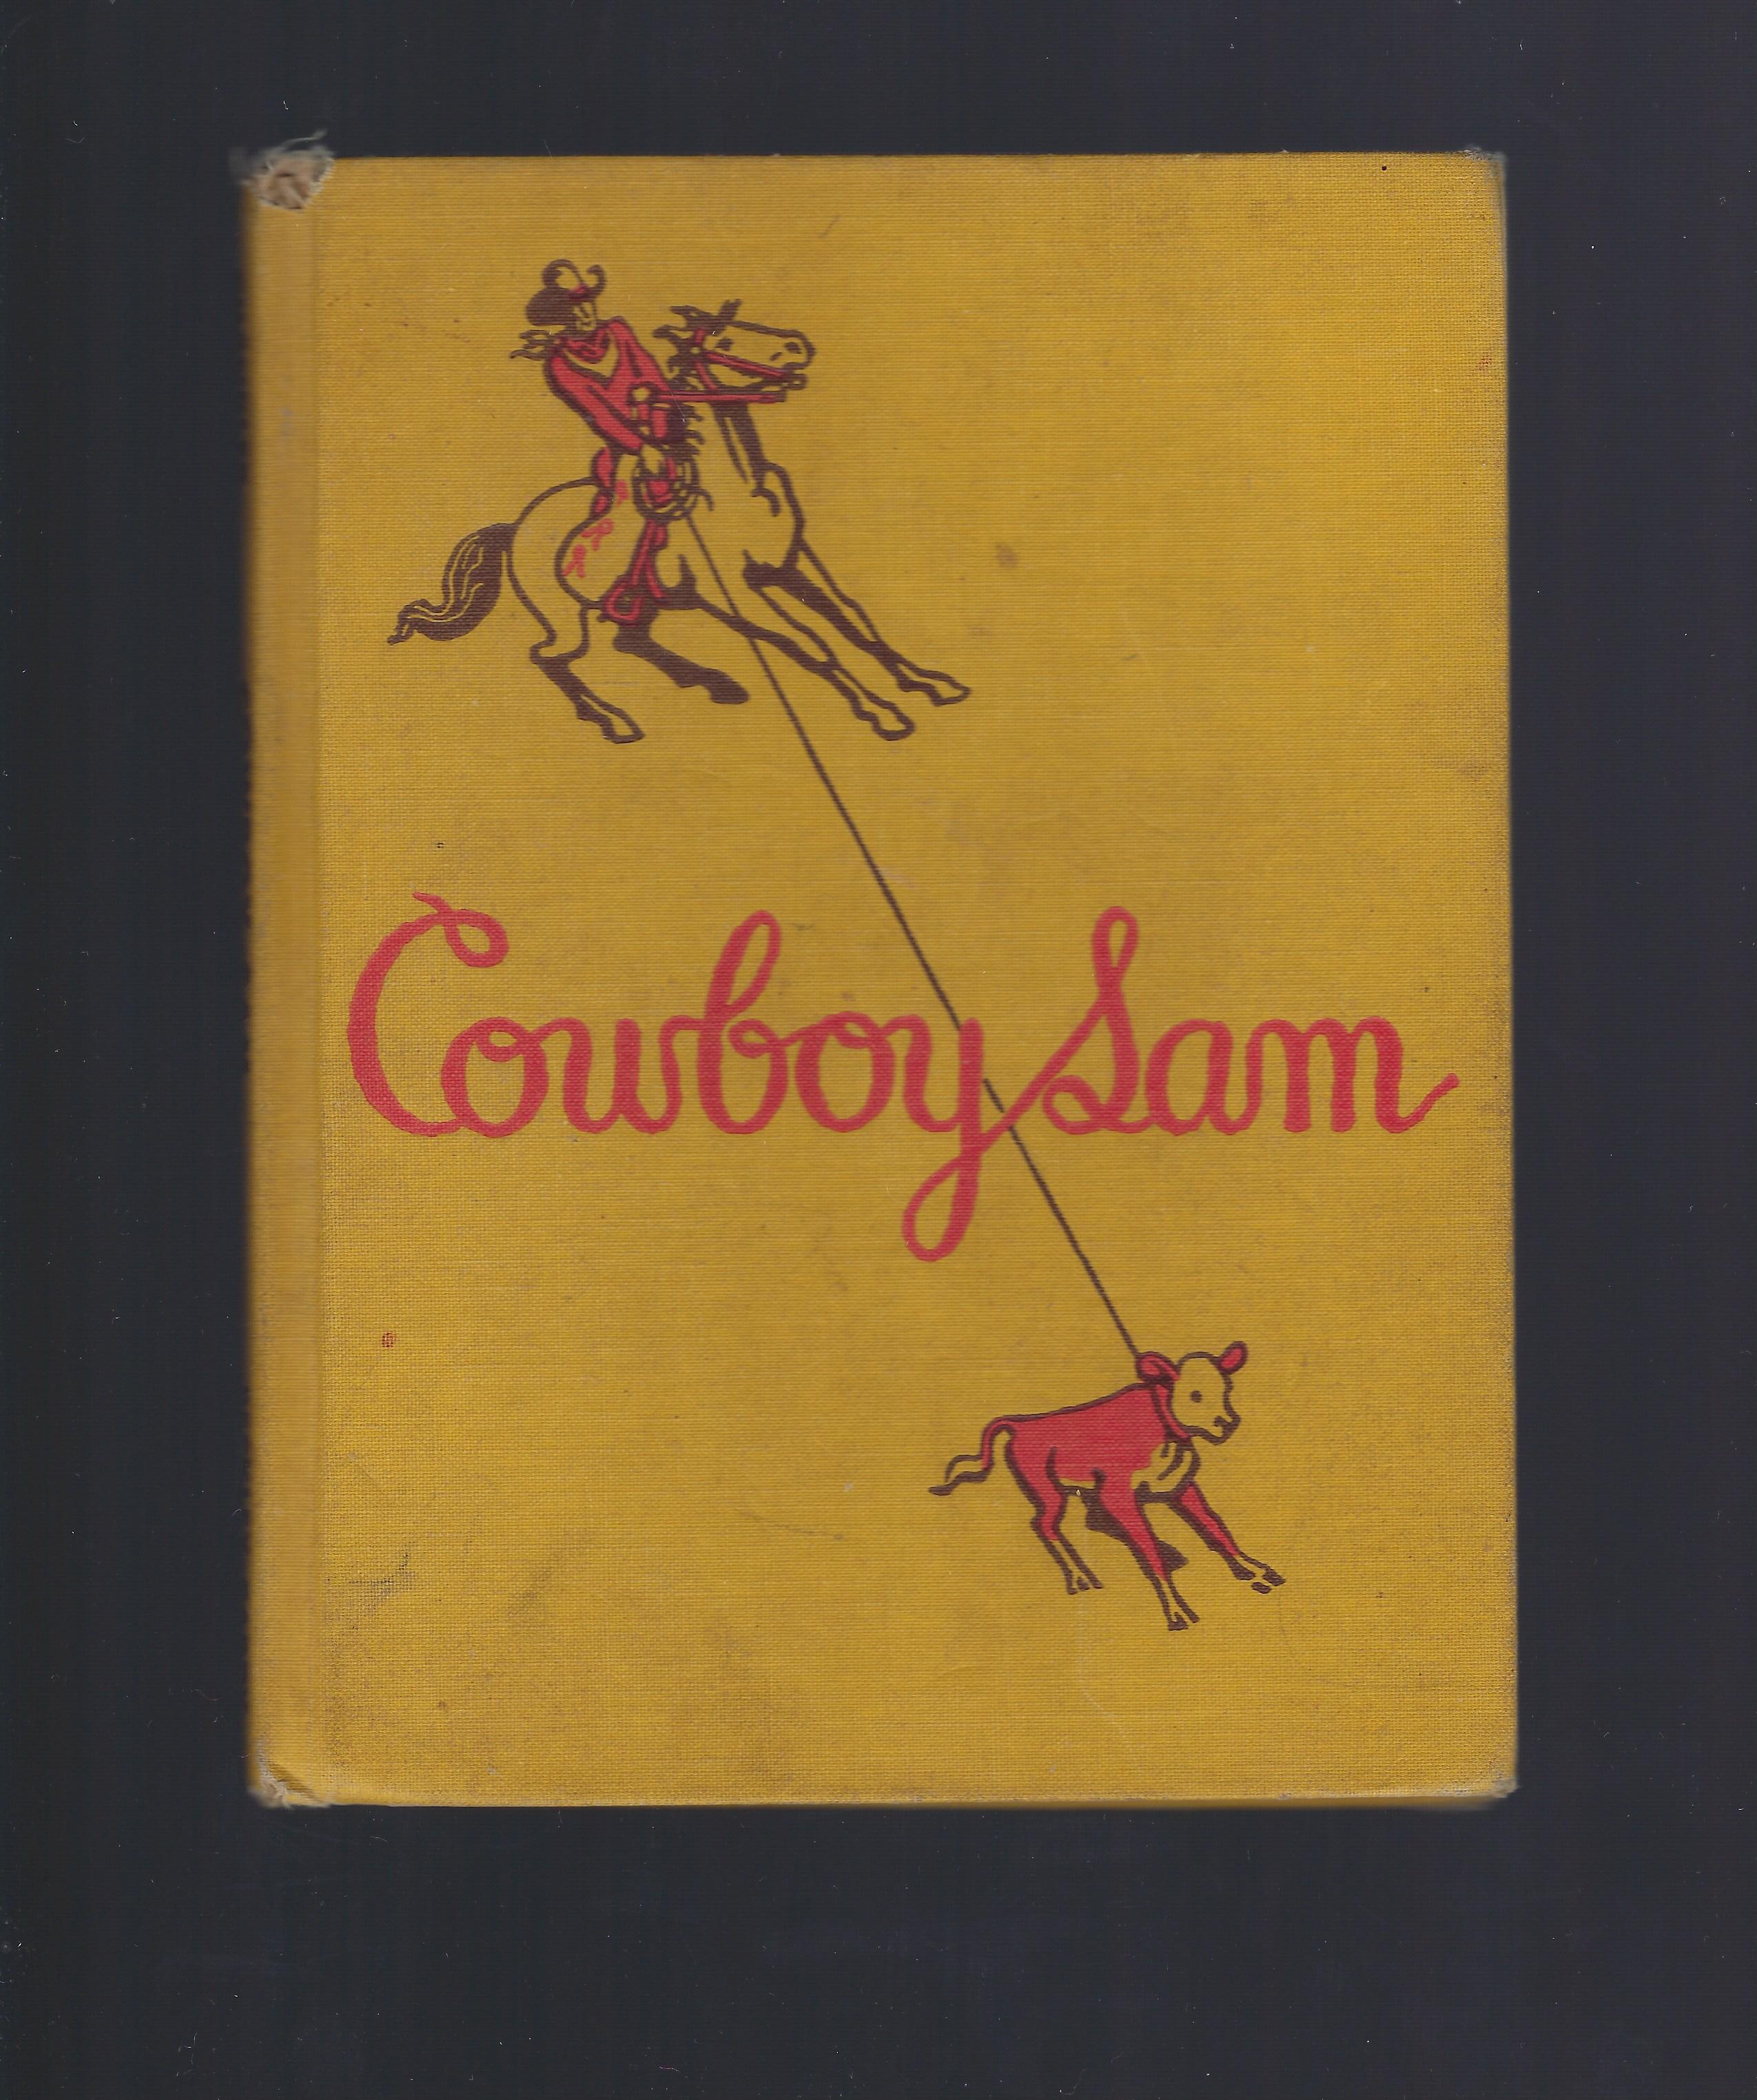 Cowboy Sam Reader First Reader in Series (1951), Chandler, Edna Walker